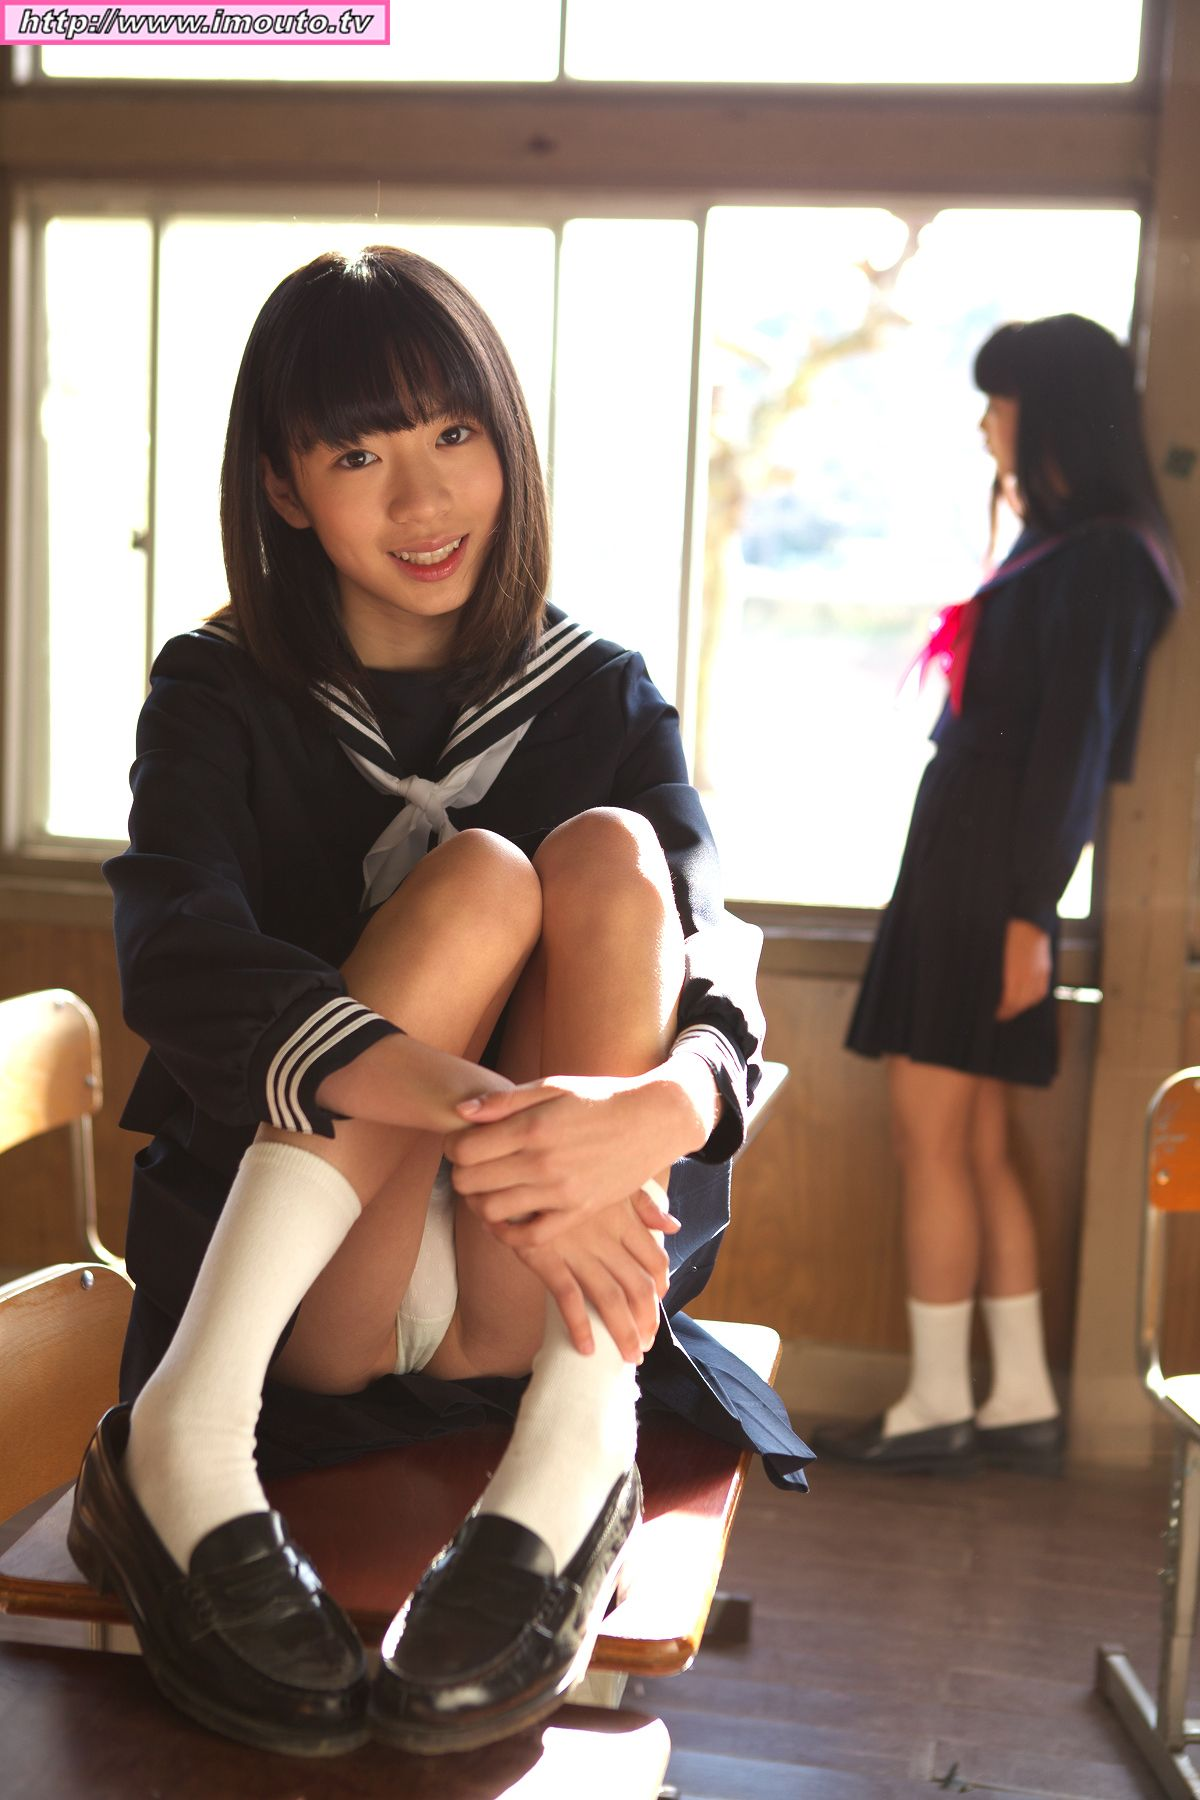 ayu makihara 1 gravure promotion pictures, Makihara Ayu (牧原あゆ), Shiina Momo